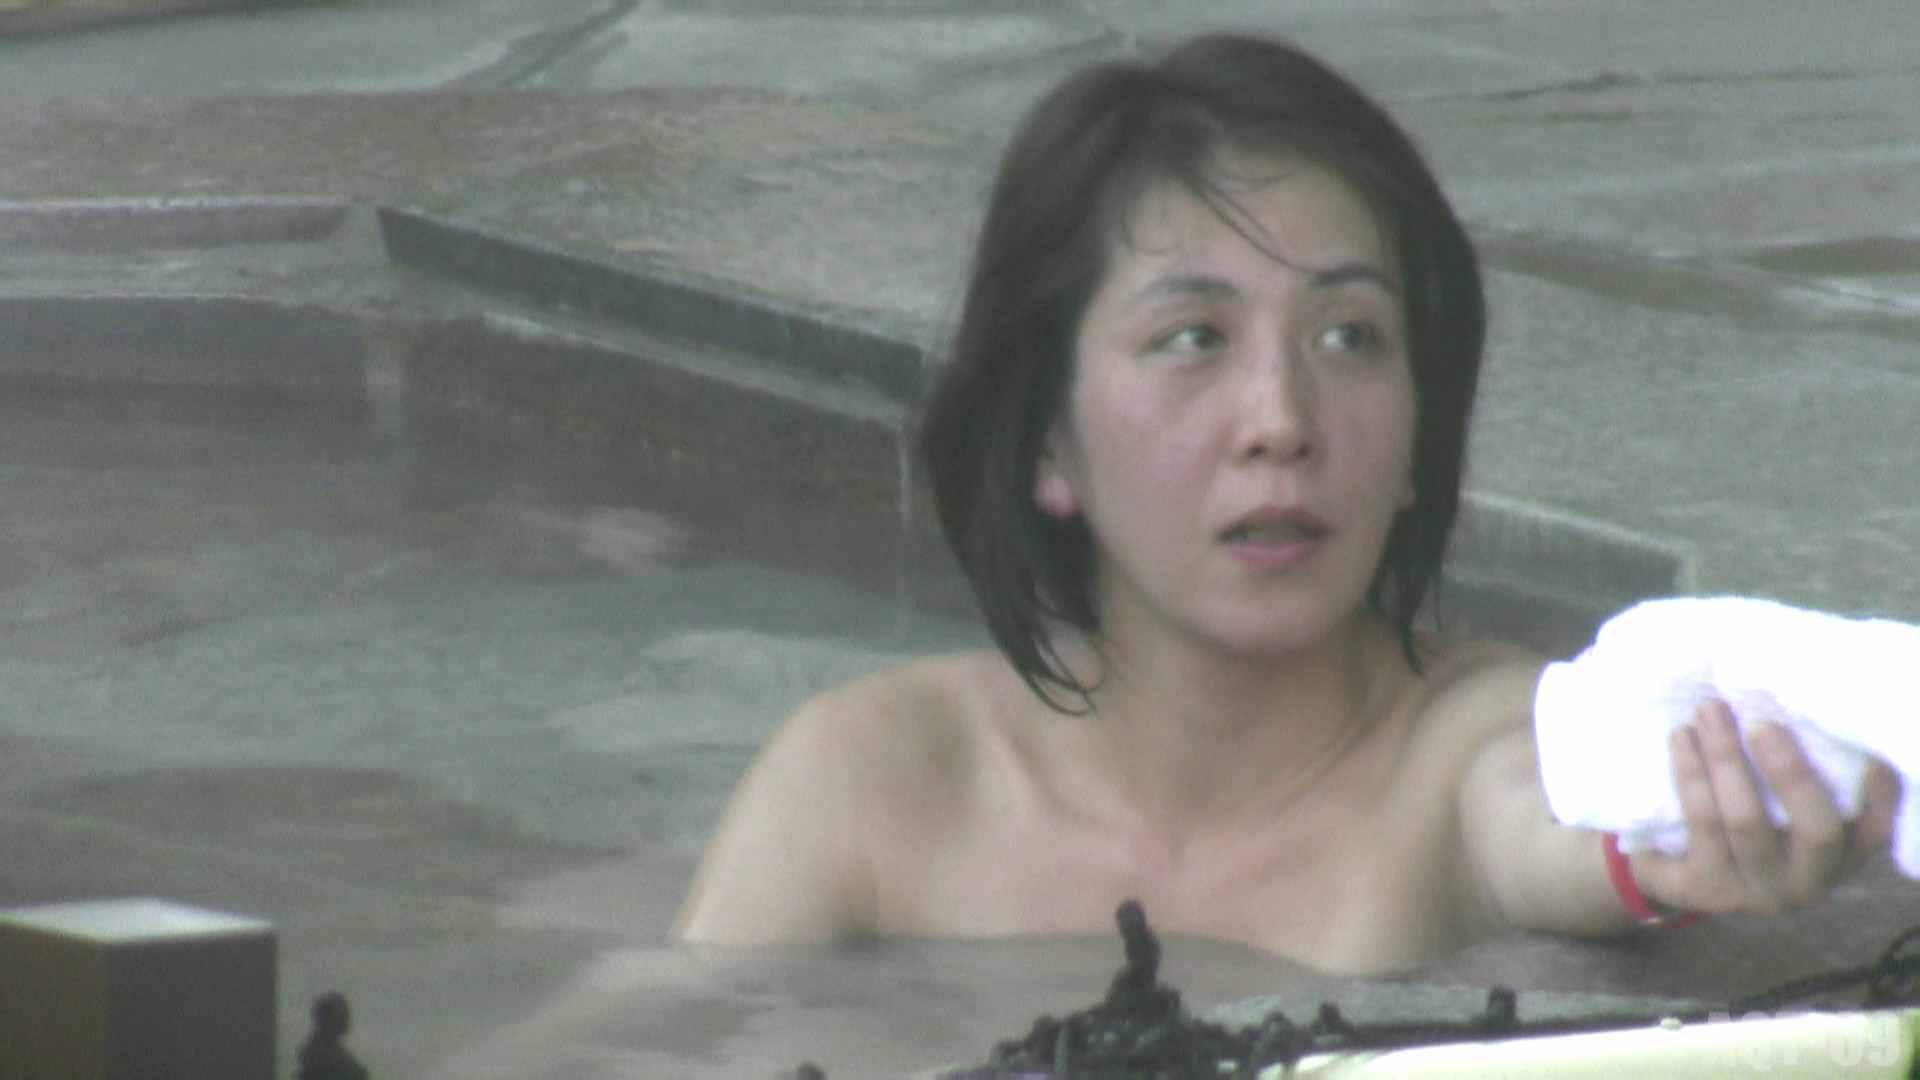 Aquaな露天風呂Vol.788 盗撮シリーズ | 露天風呂編  105PIX 39